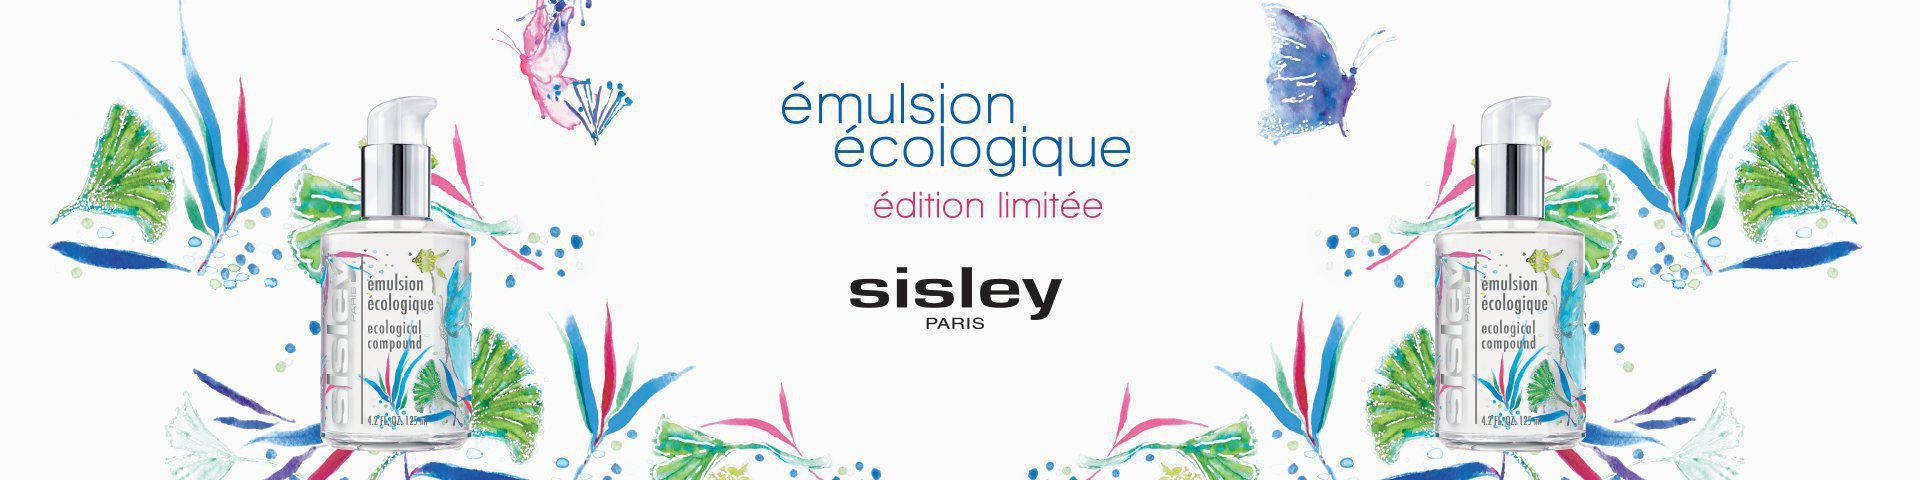 Sisley new